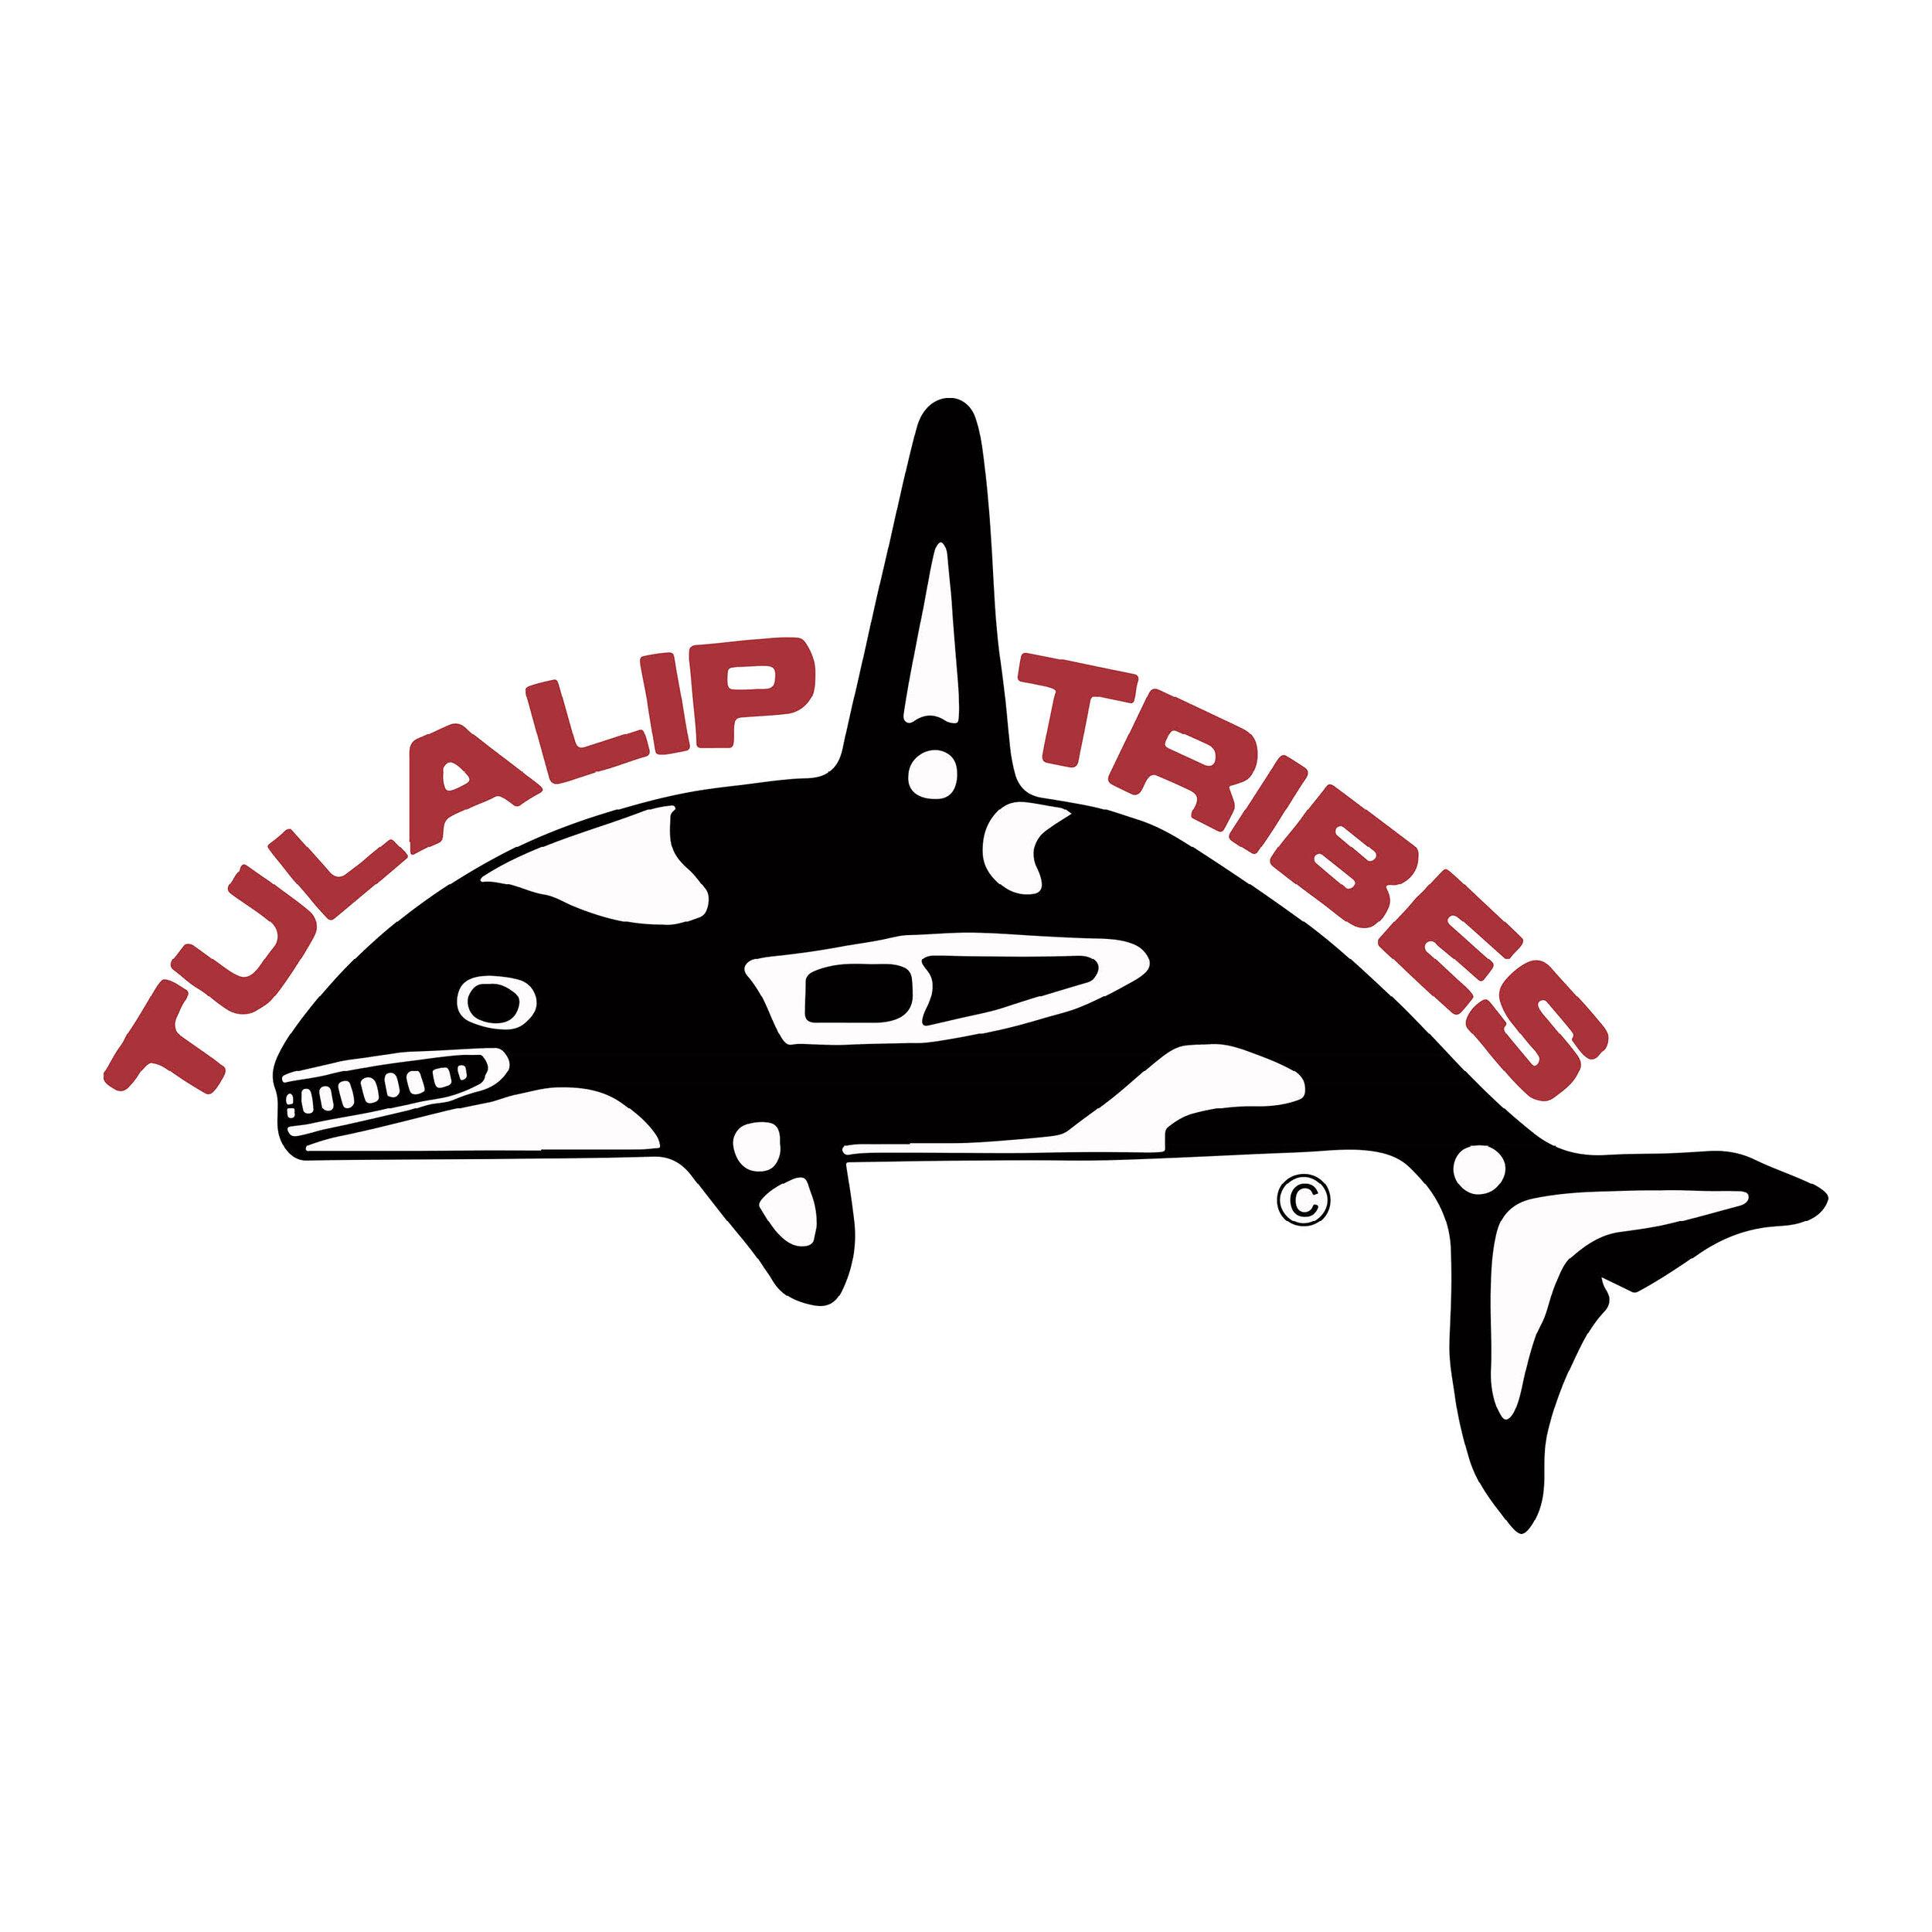 Tulalip_logo.jpg